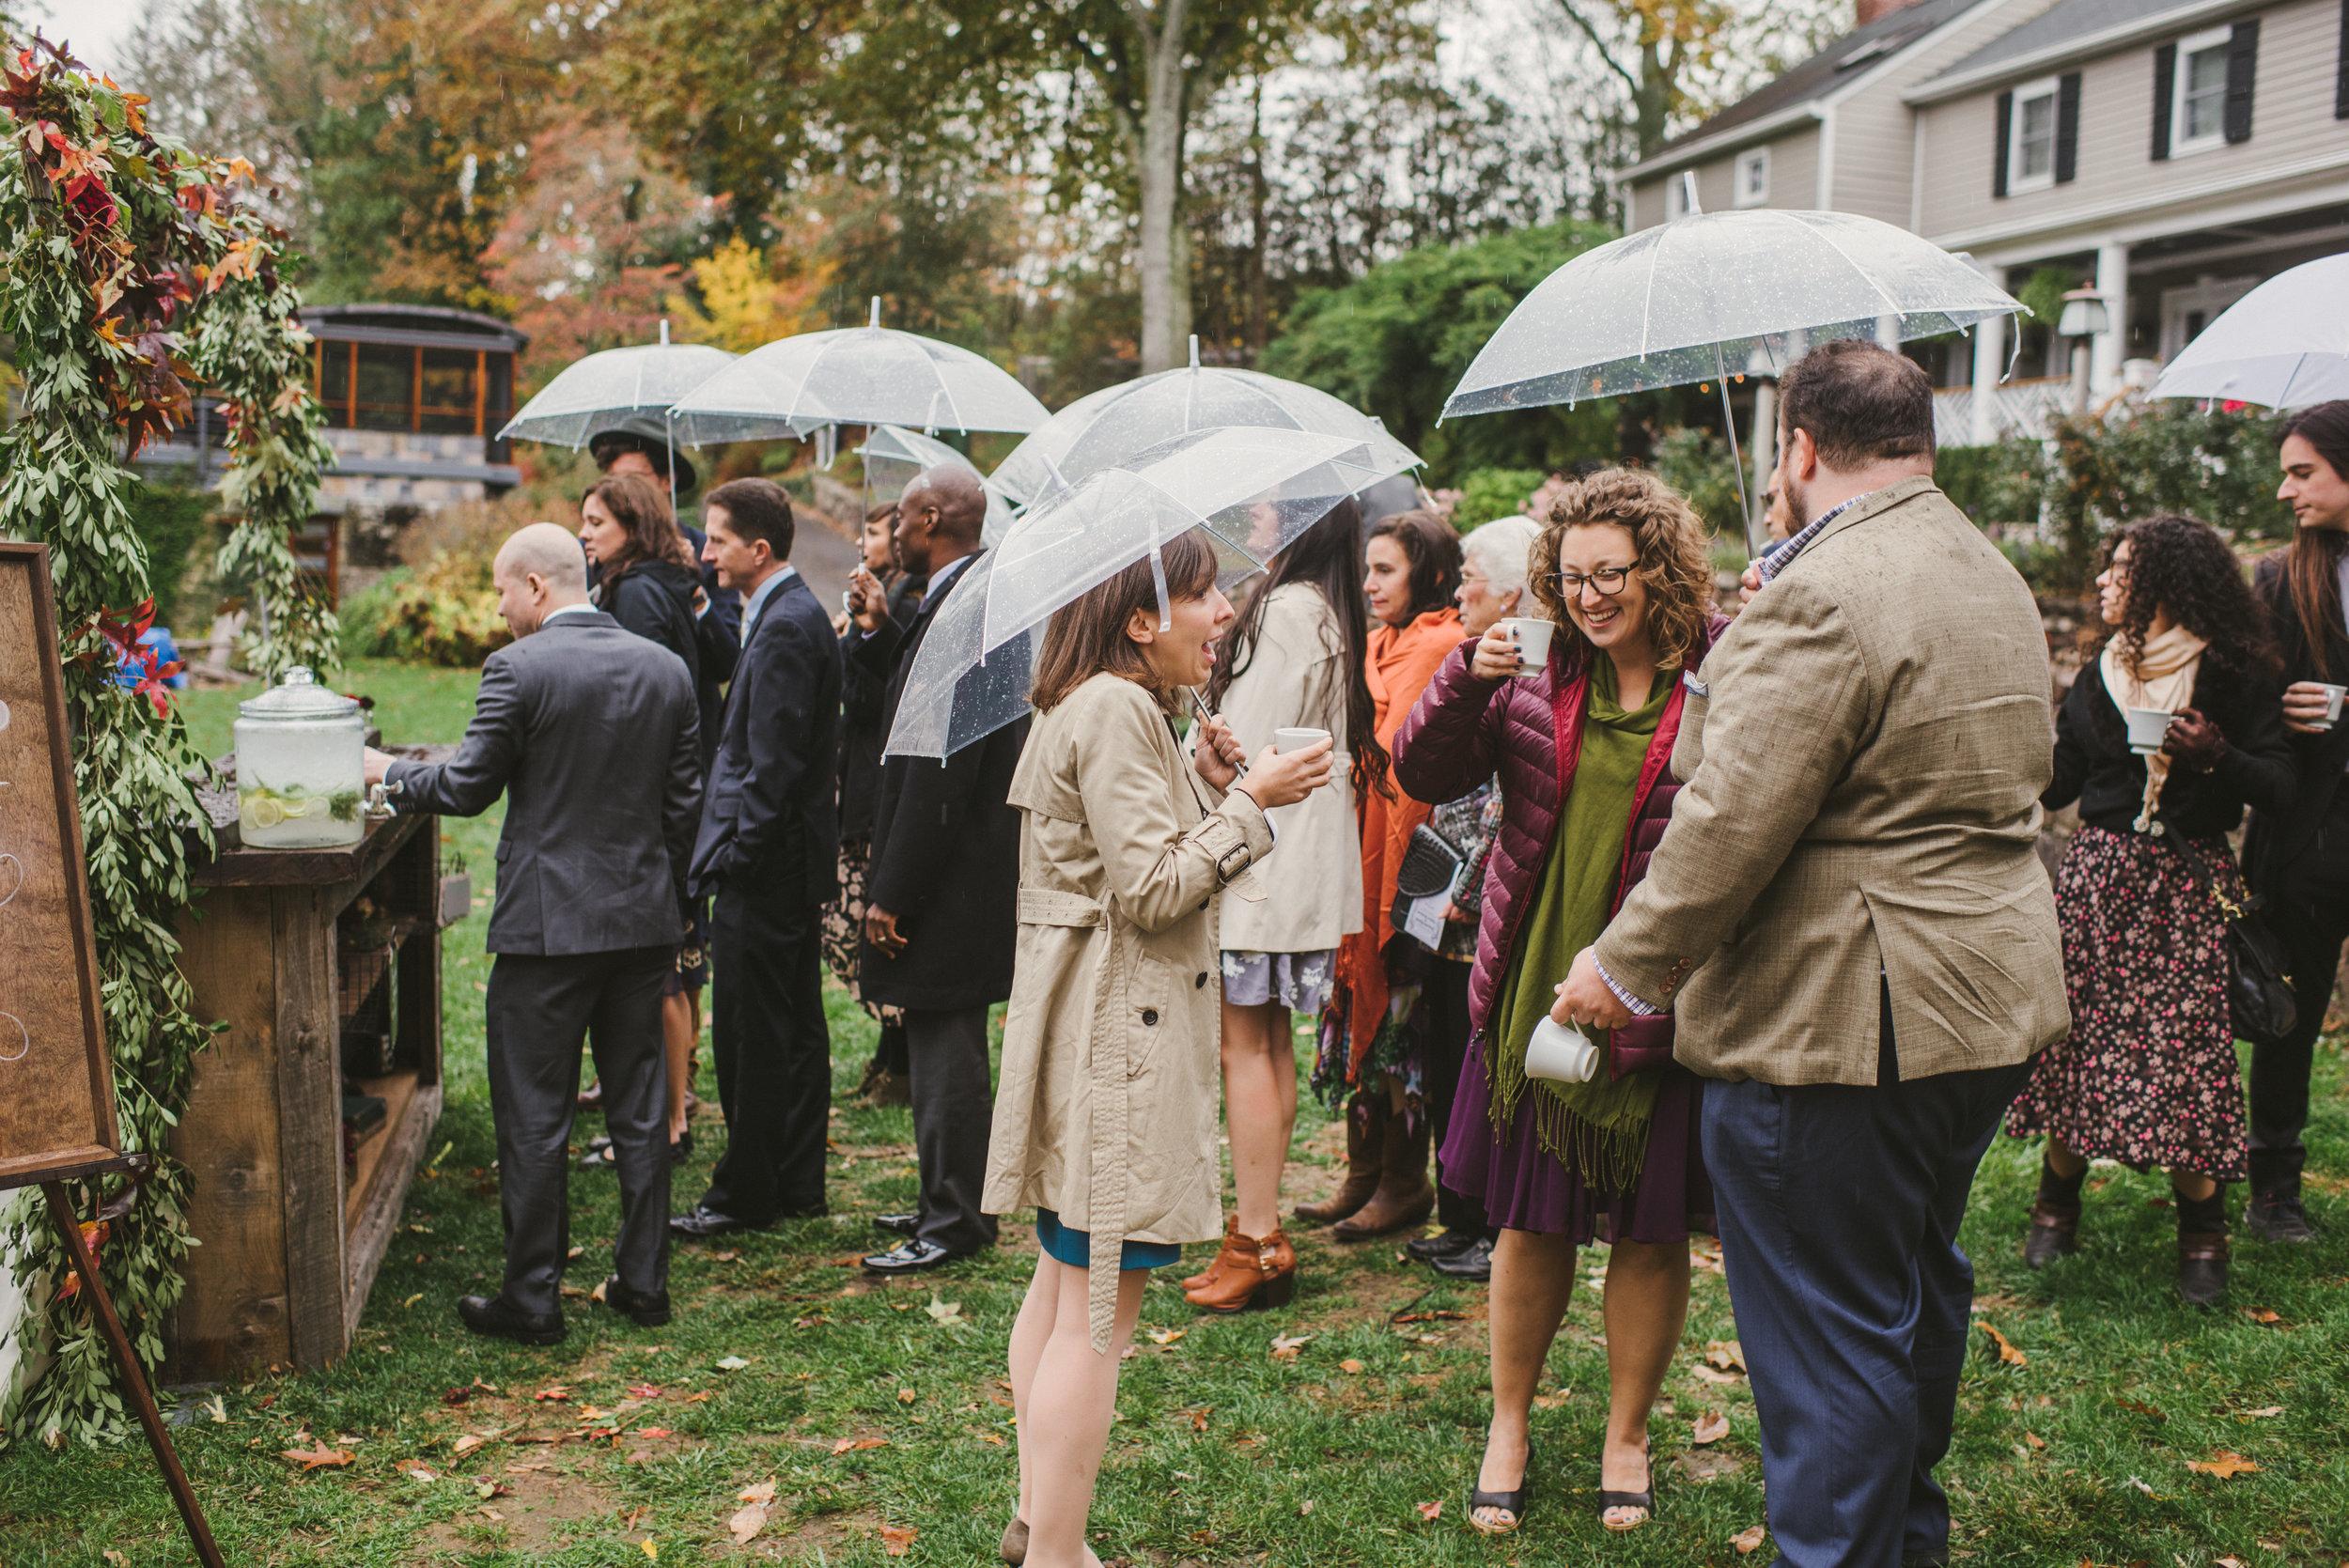 JACQUELINE & ANDREW WARSHAWER -BROOKMILL FARM FALL WEDDING - INTIMATE WEDDING PHOTOGRAPHER - TWOTWENTY by CHI-CHI AGBIM-167.jpg